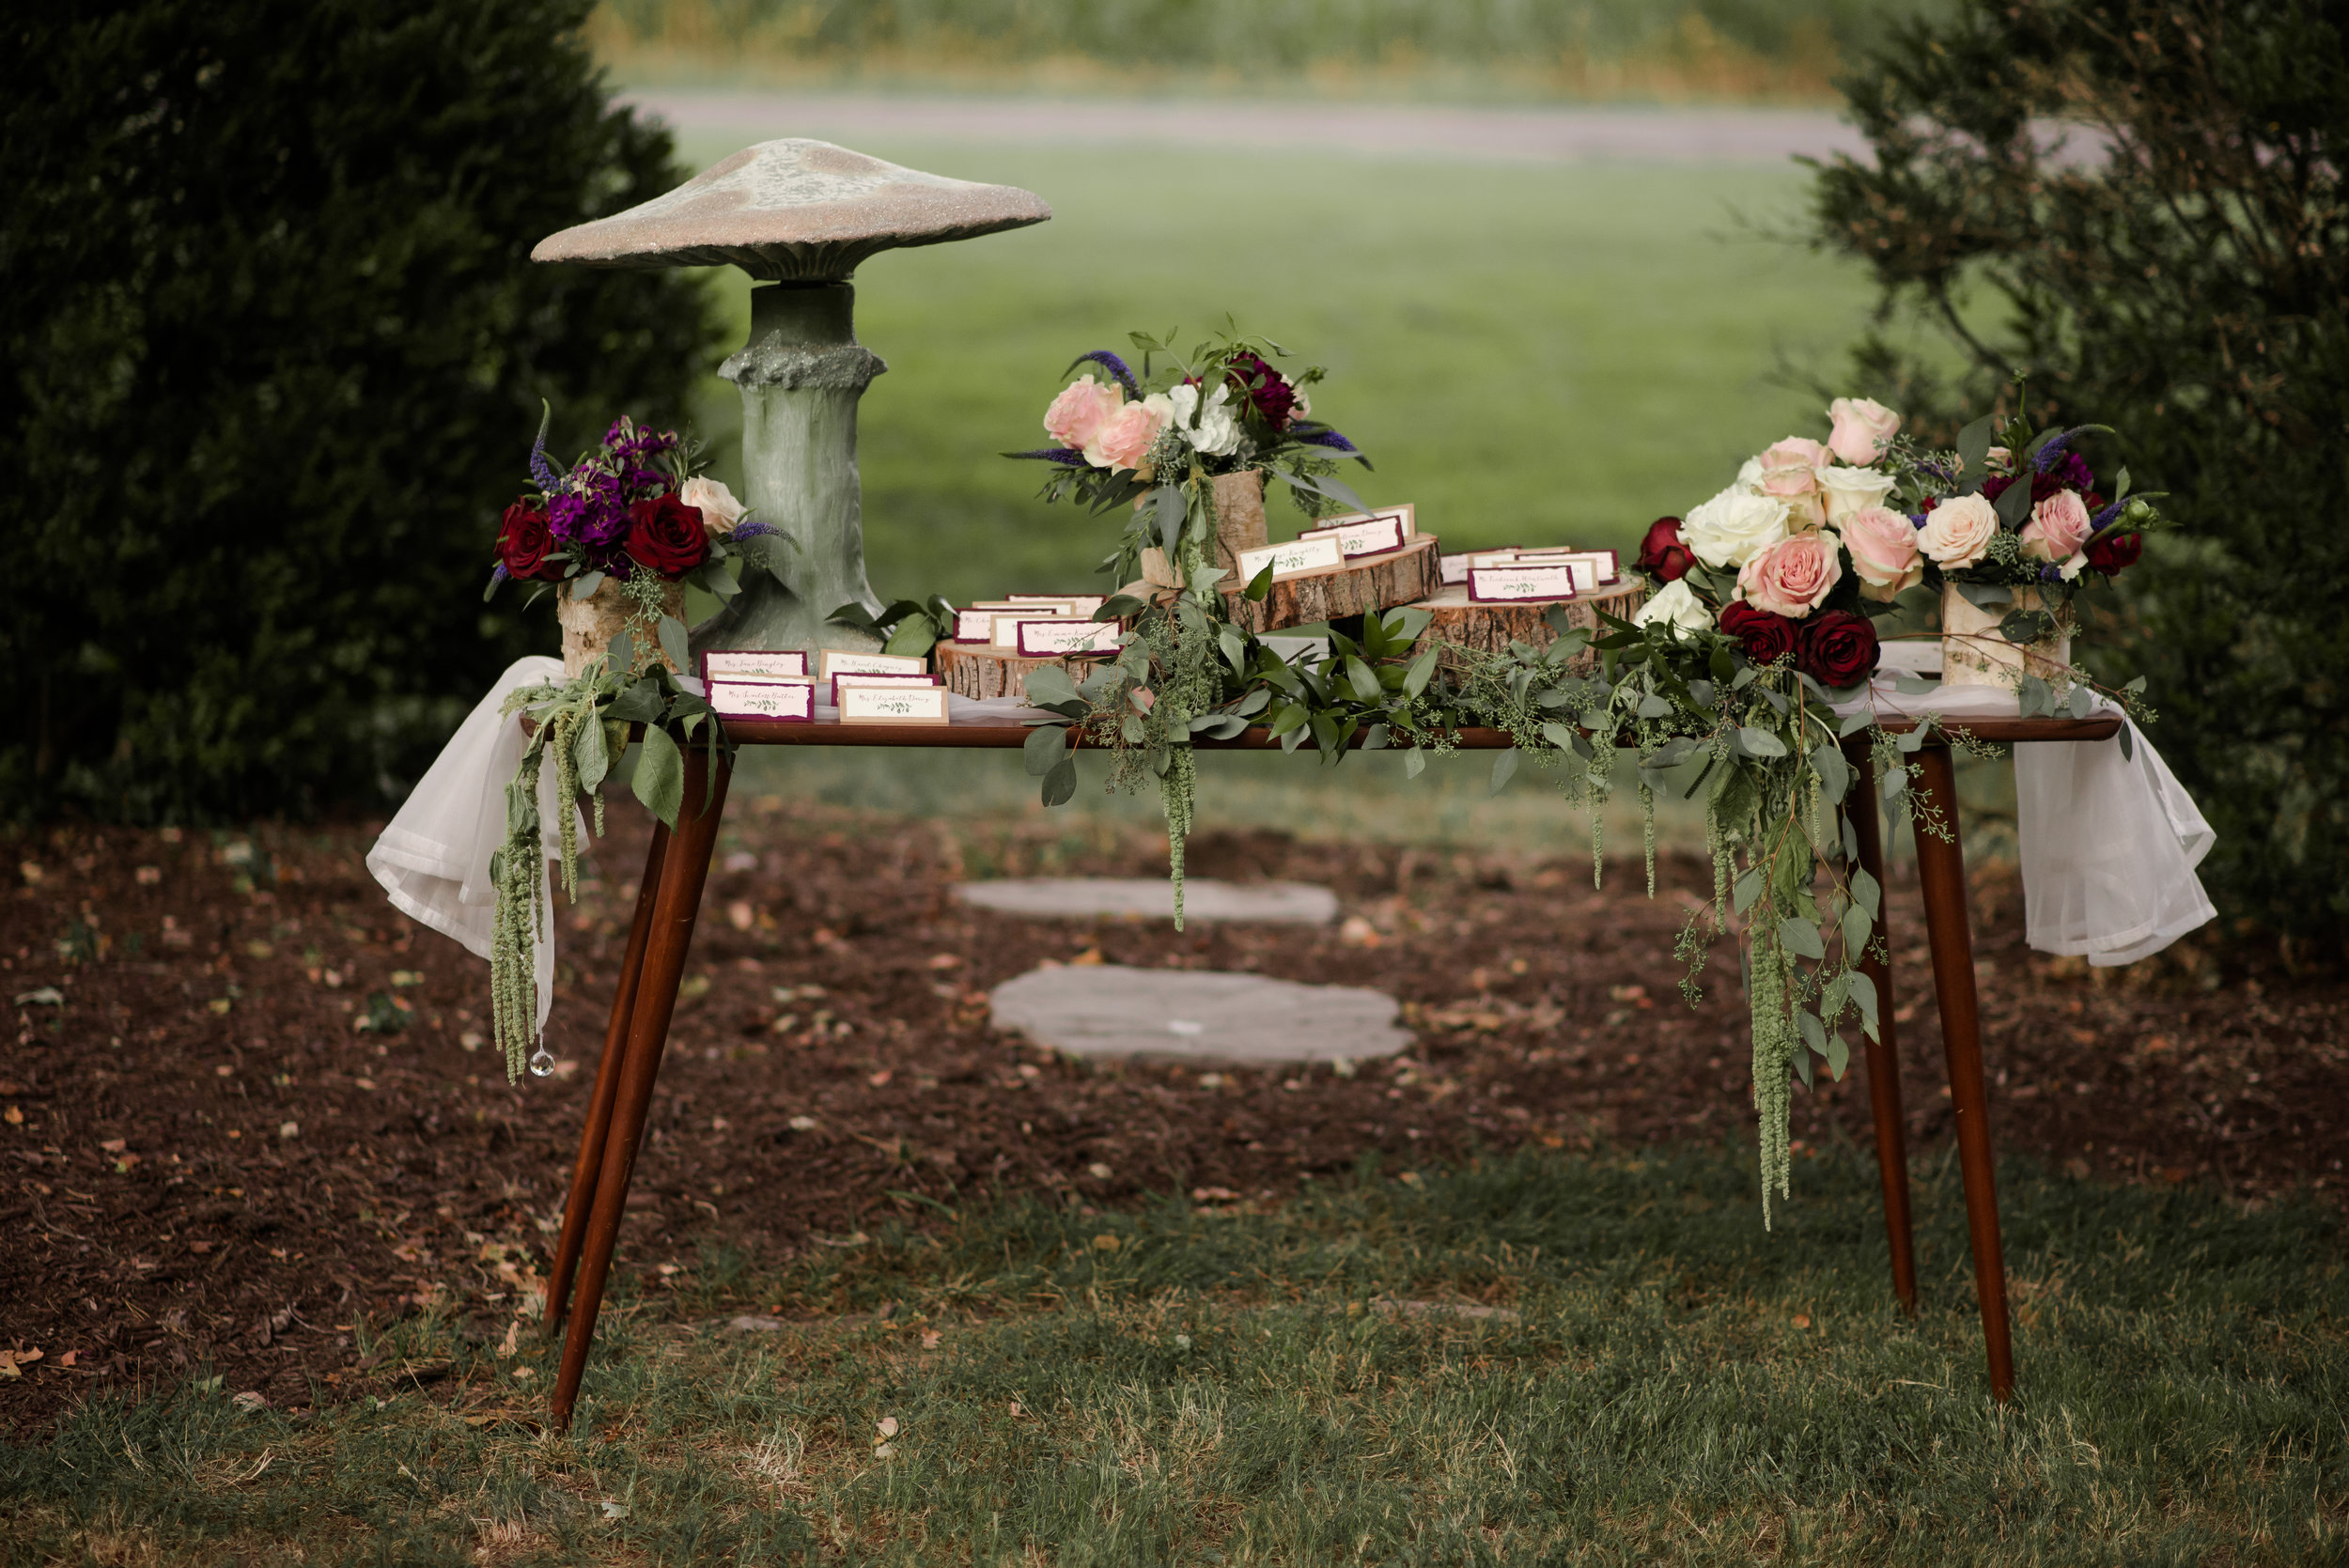 midsummers-eve-wedding-floral-blush-dress-david-tutera-cary-hill-plantation-photo-virginia-bride-293.jpg